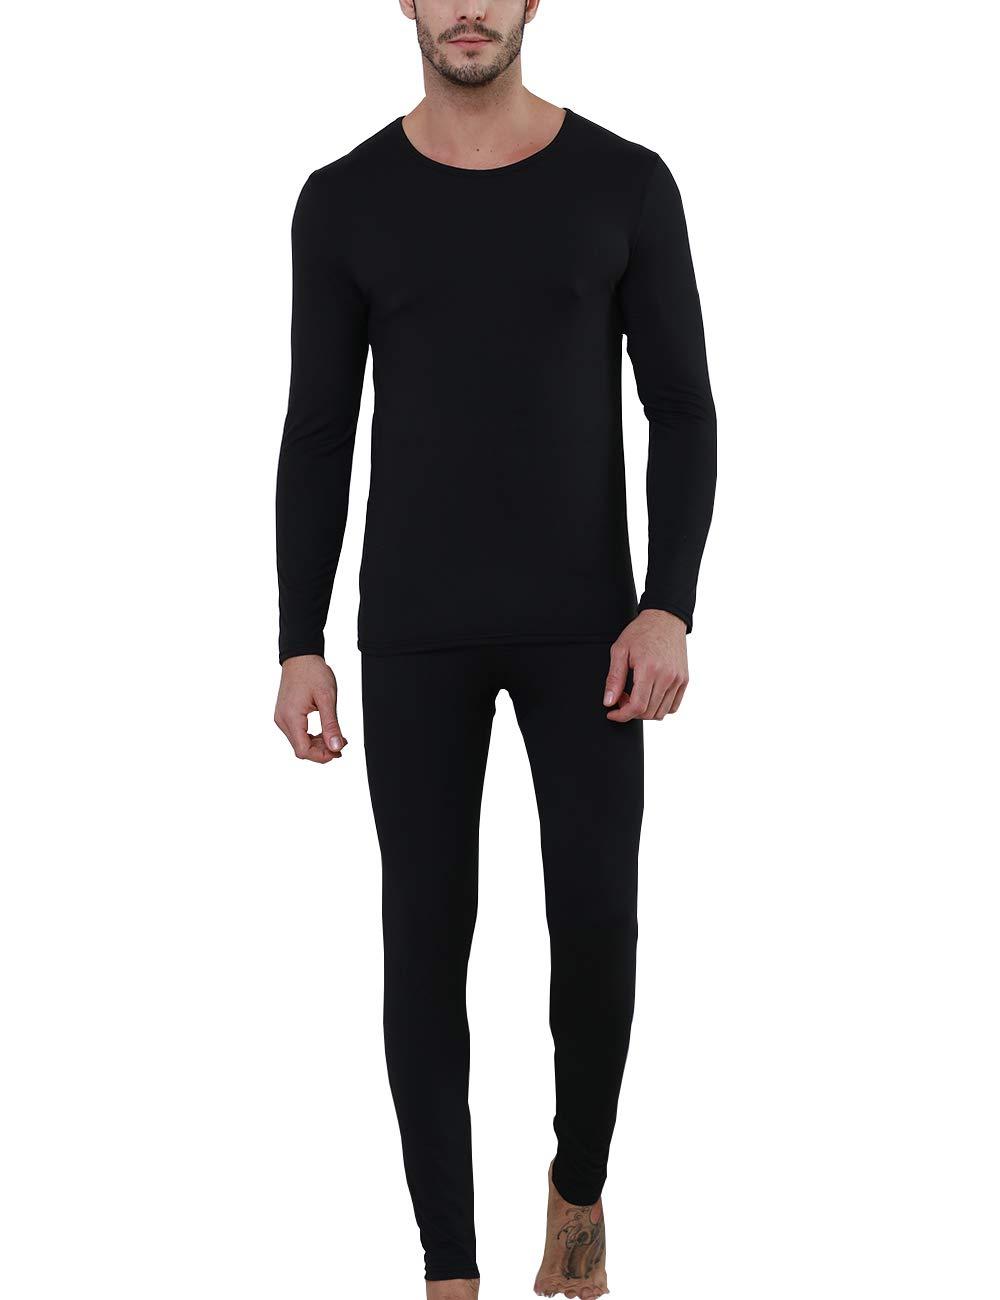 Thermal Underwear for Men Long John Set Thin Fleece Base Layer Ultra Soft Underneath Sleepwear Top and Pant